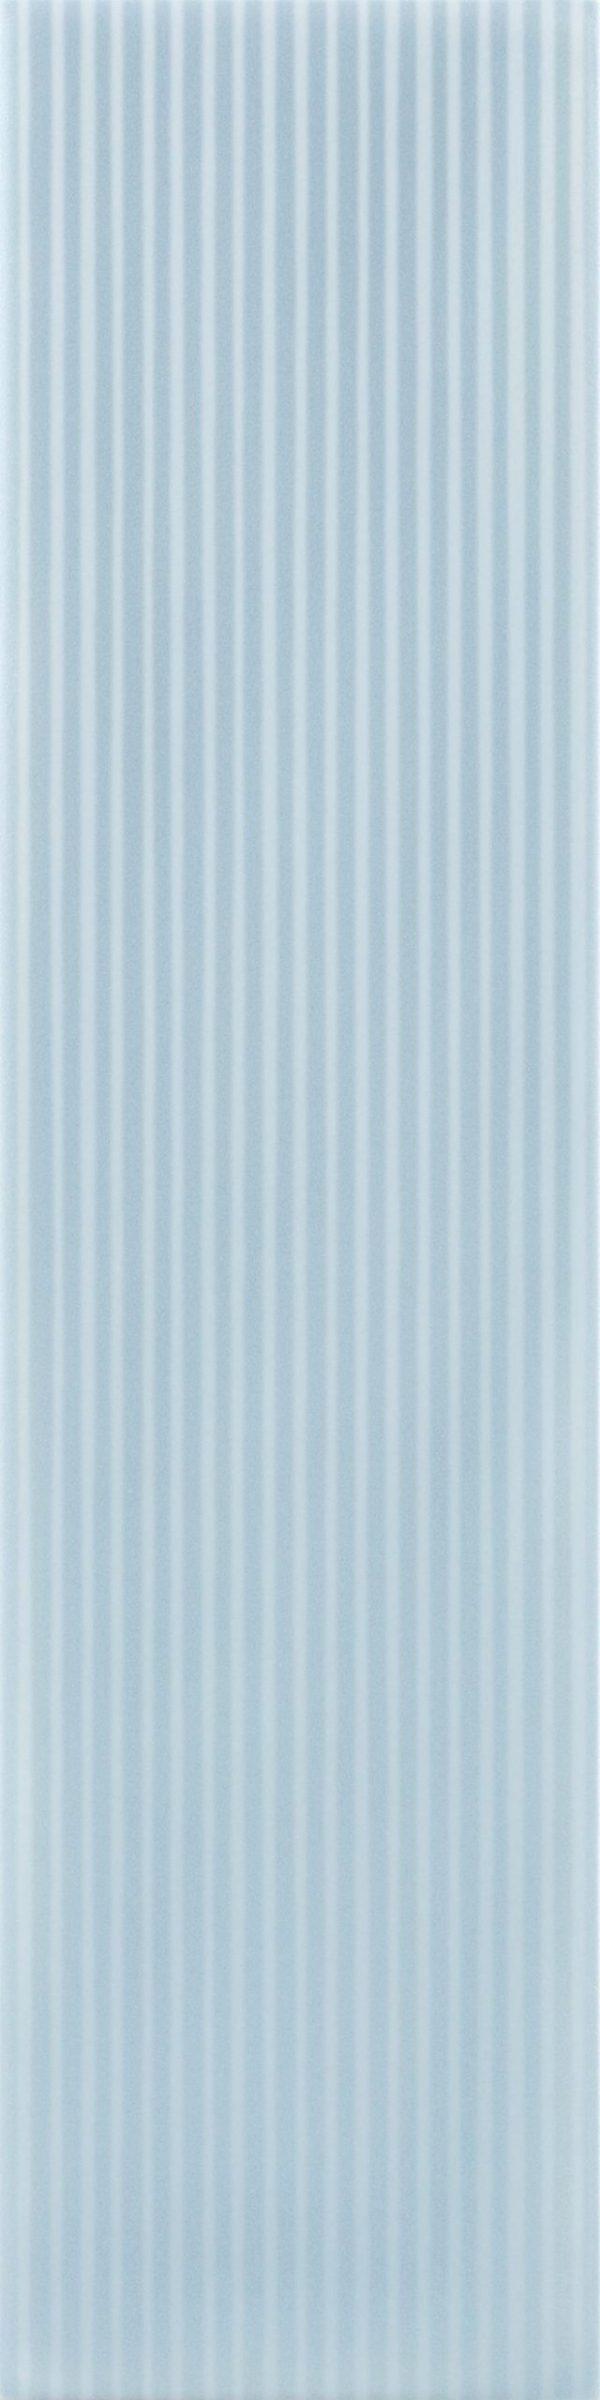 Gradient Decor - Blue Matt